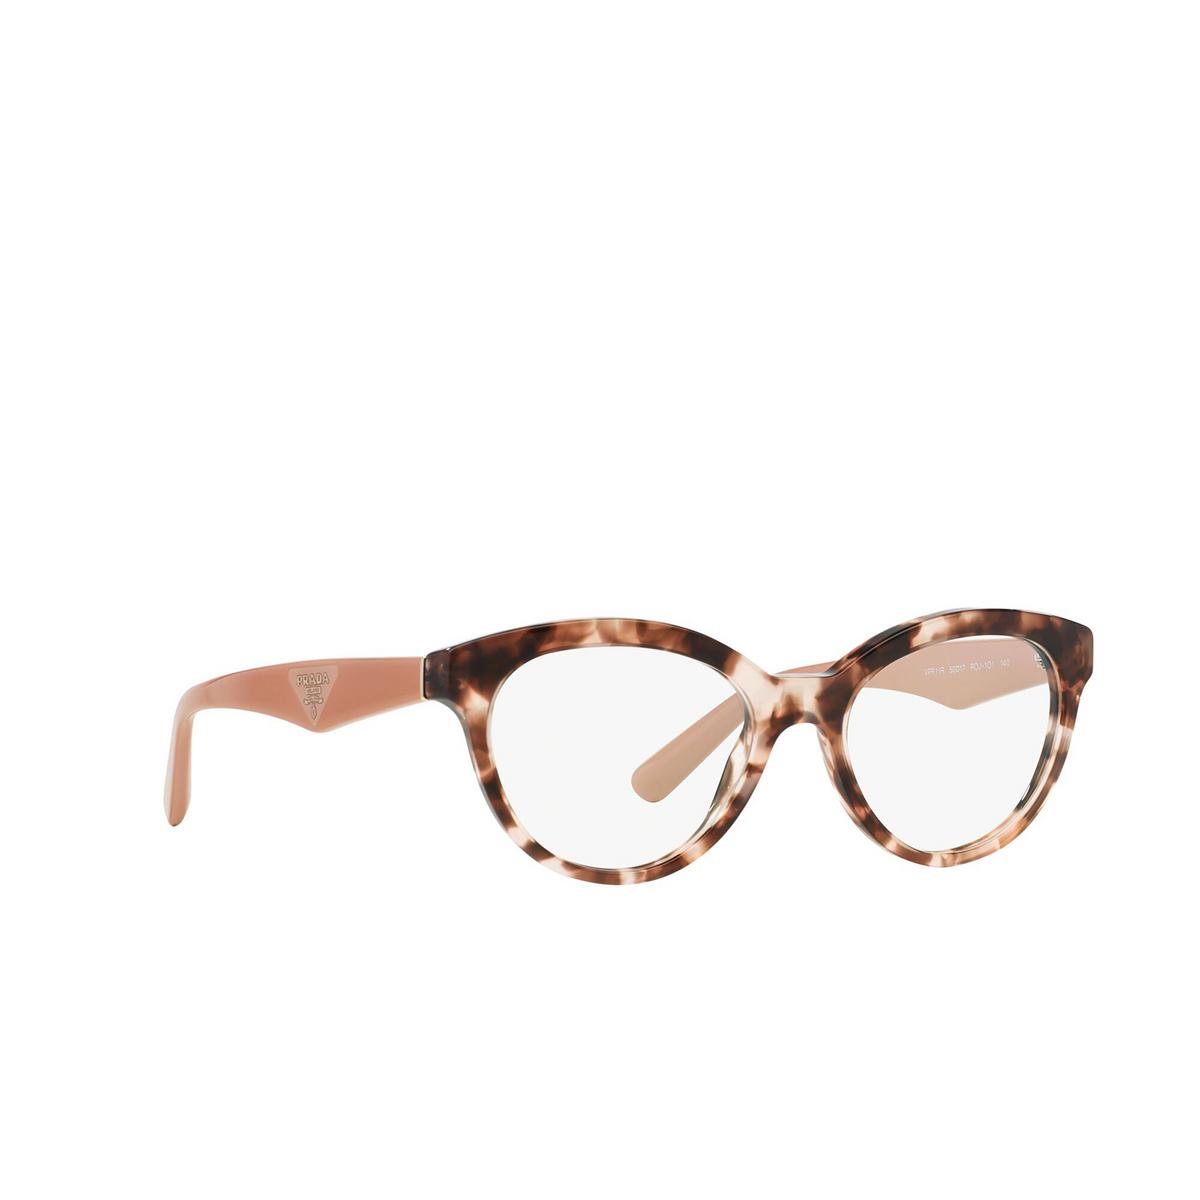 Prada® Square Eyeglasses: Heritage PR 11RV color Pink Havana ROJ1O1 - three-quarters view.